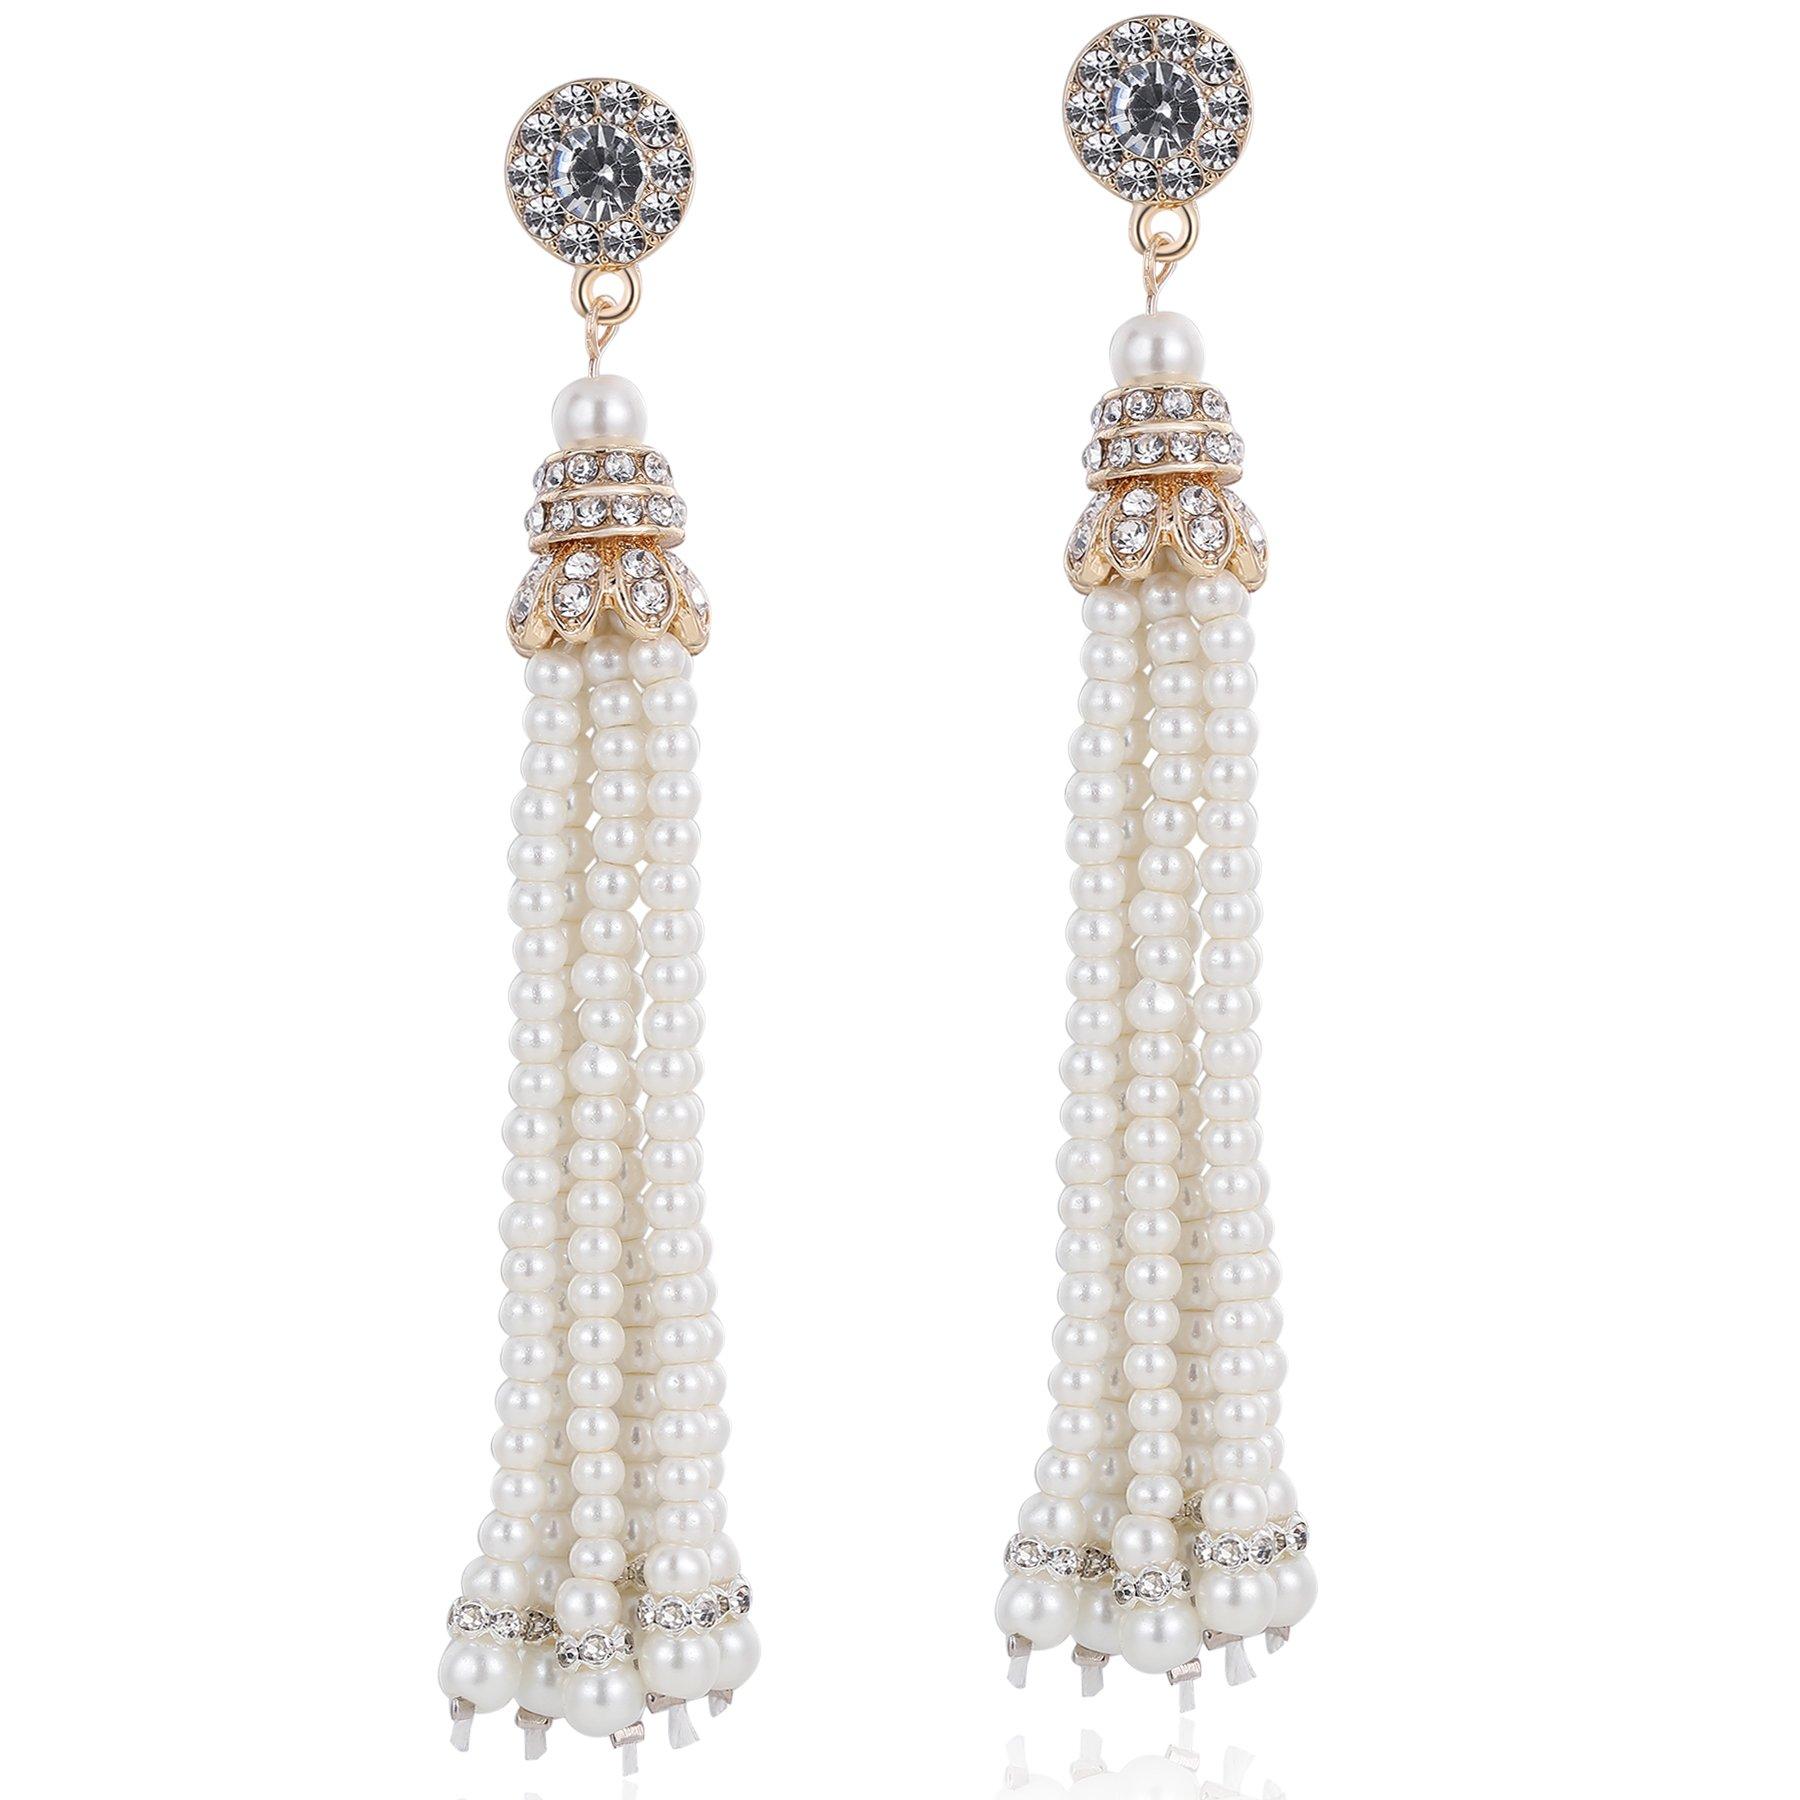 BABEYOND 1920s Flapper Imitation Pearl Earrings 20s Great Gatsby Pearl Tassel Earrings Vintage 20s Flapper Gatsby Accessories (Gold)